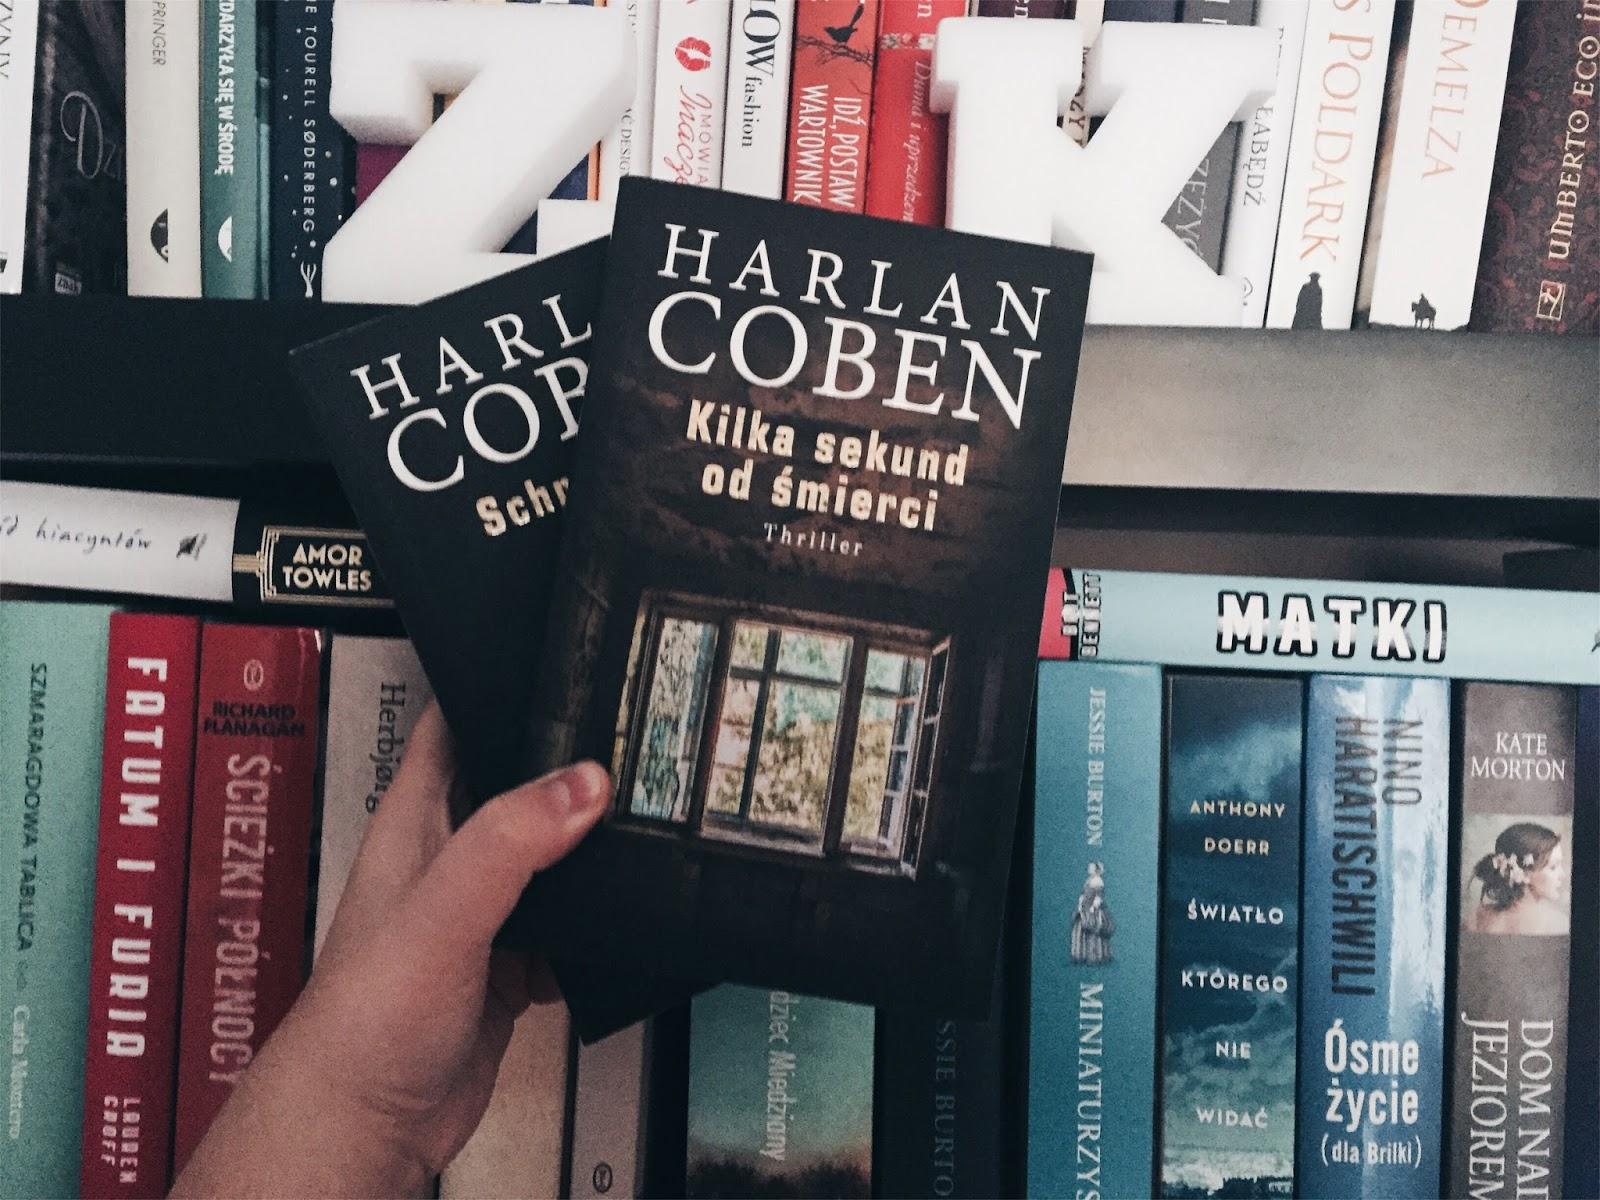 Kilka sekund od śmierci, Harlan Coben